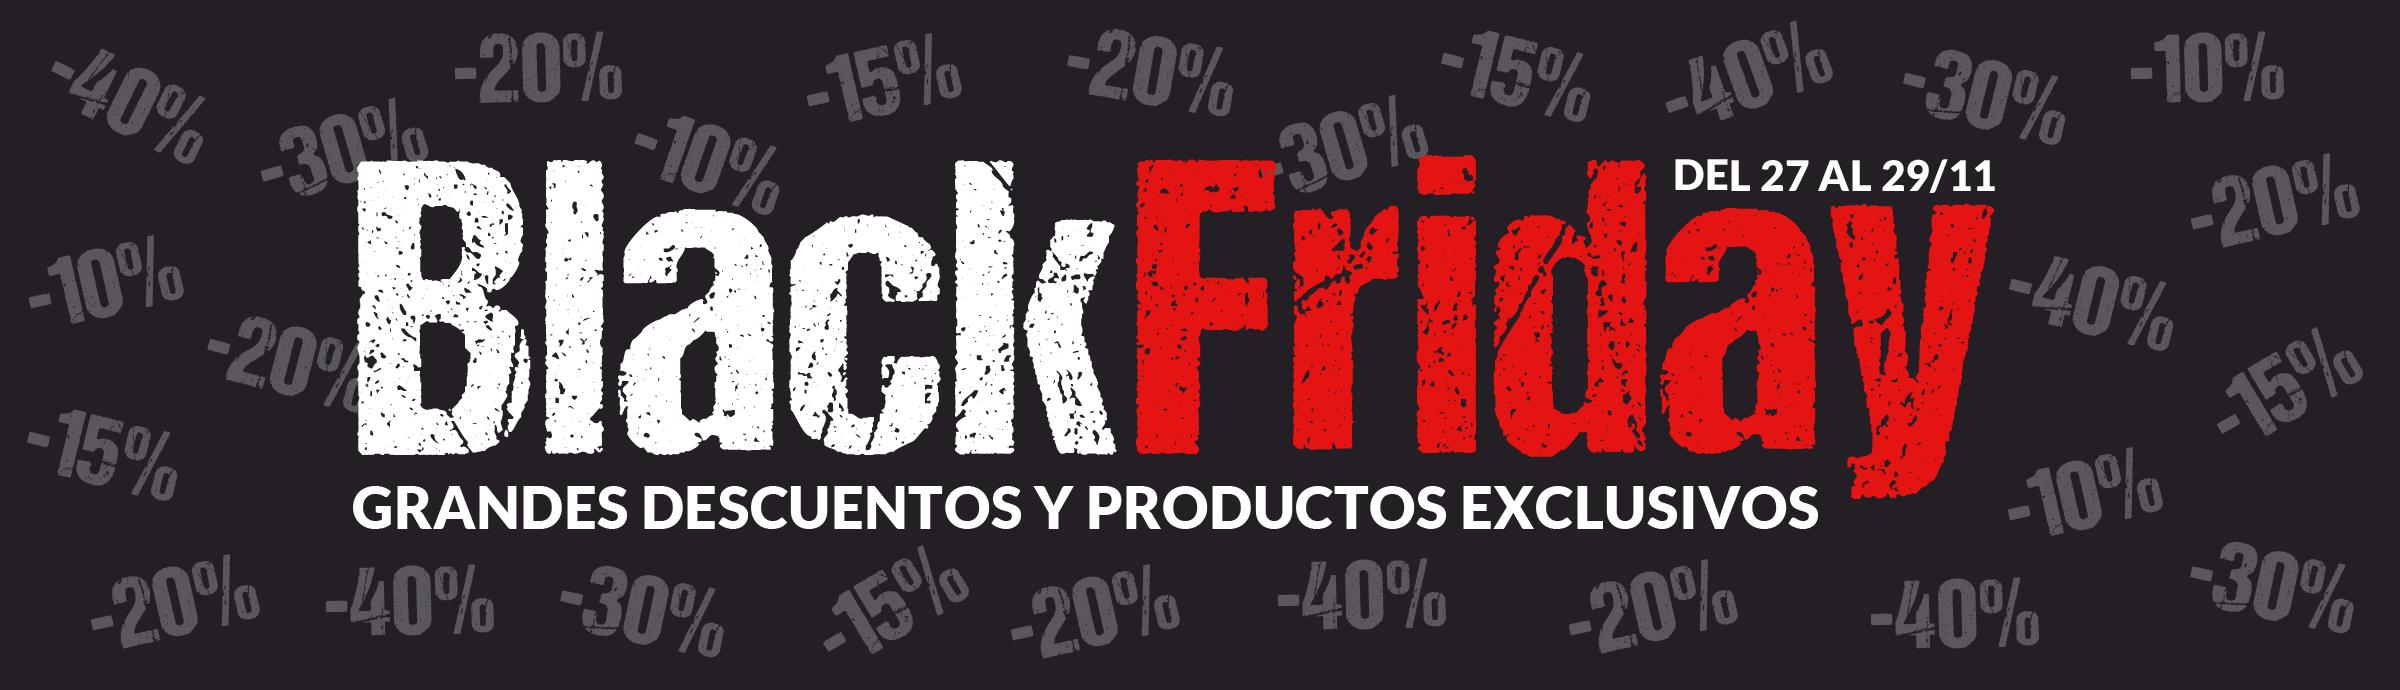 Black Friday Funko Pop 2020